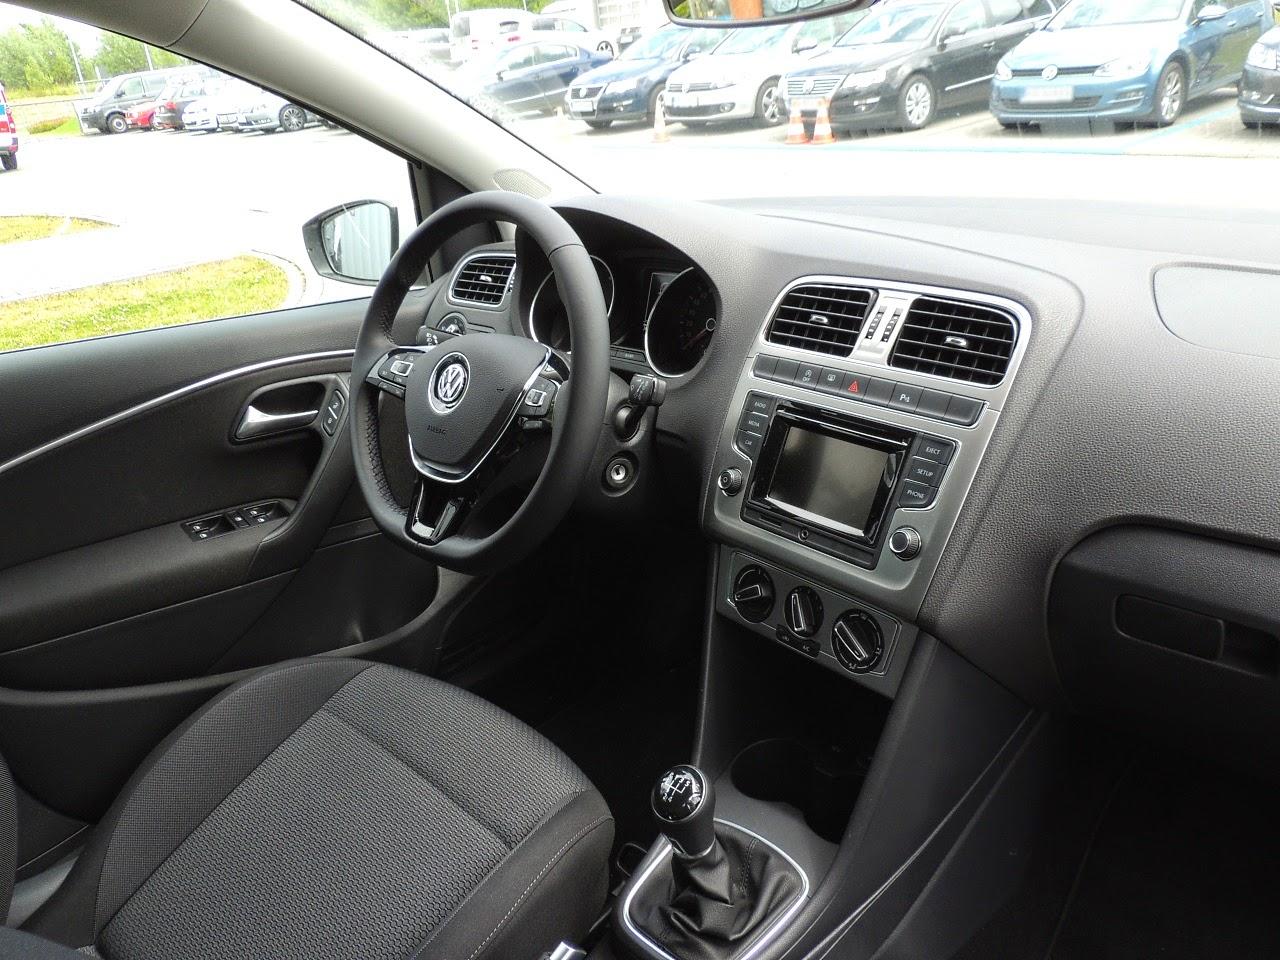 Volkswagen Polo - wnętrze